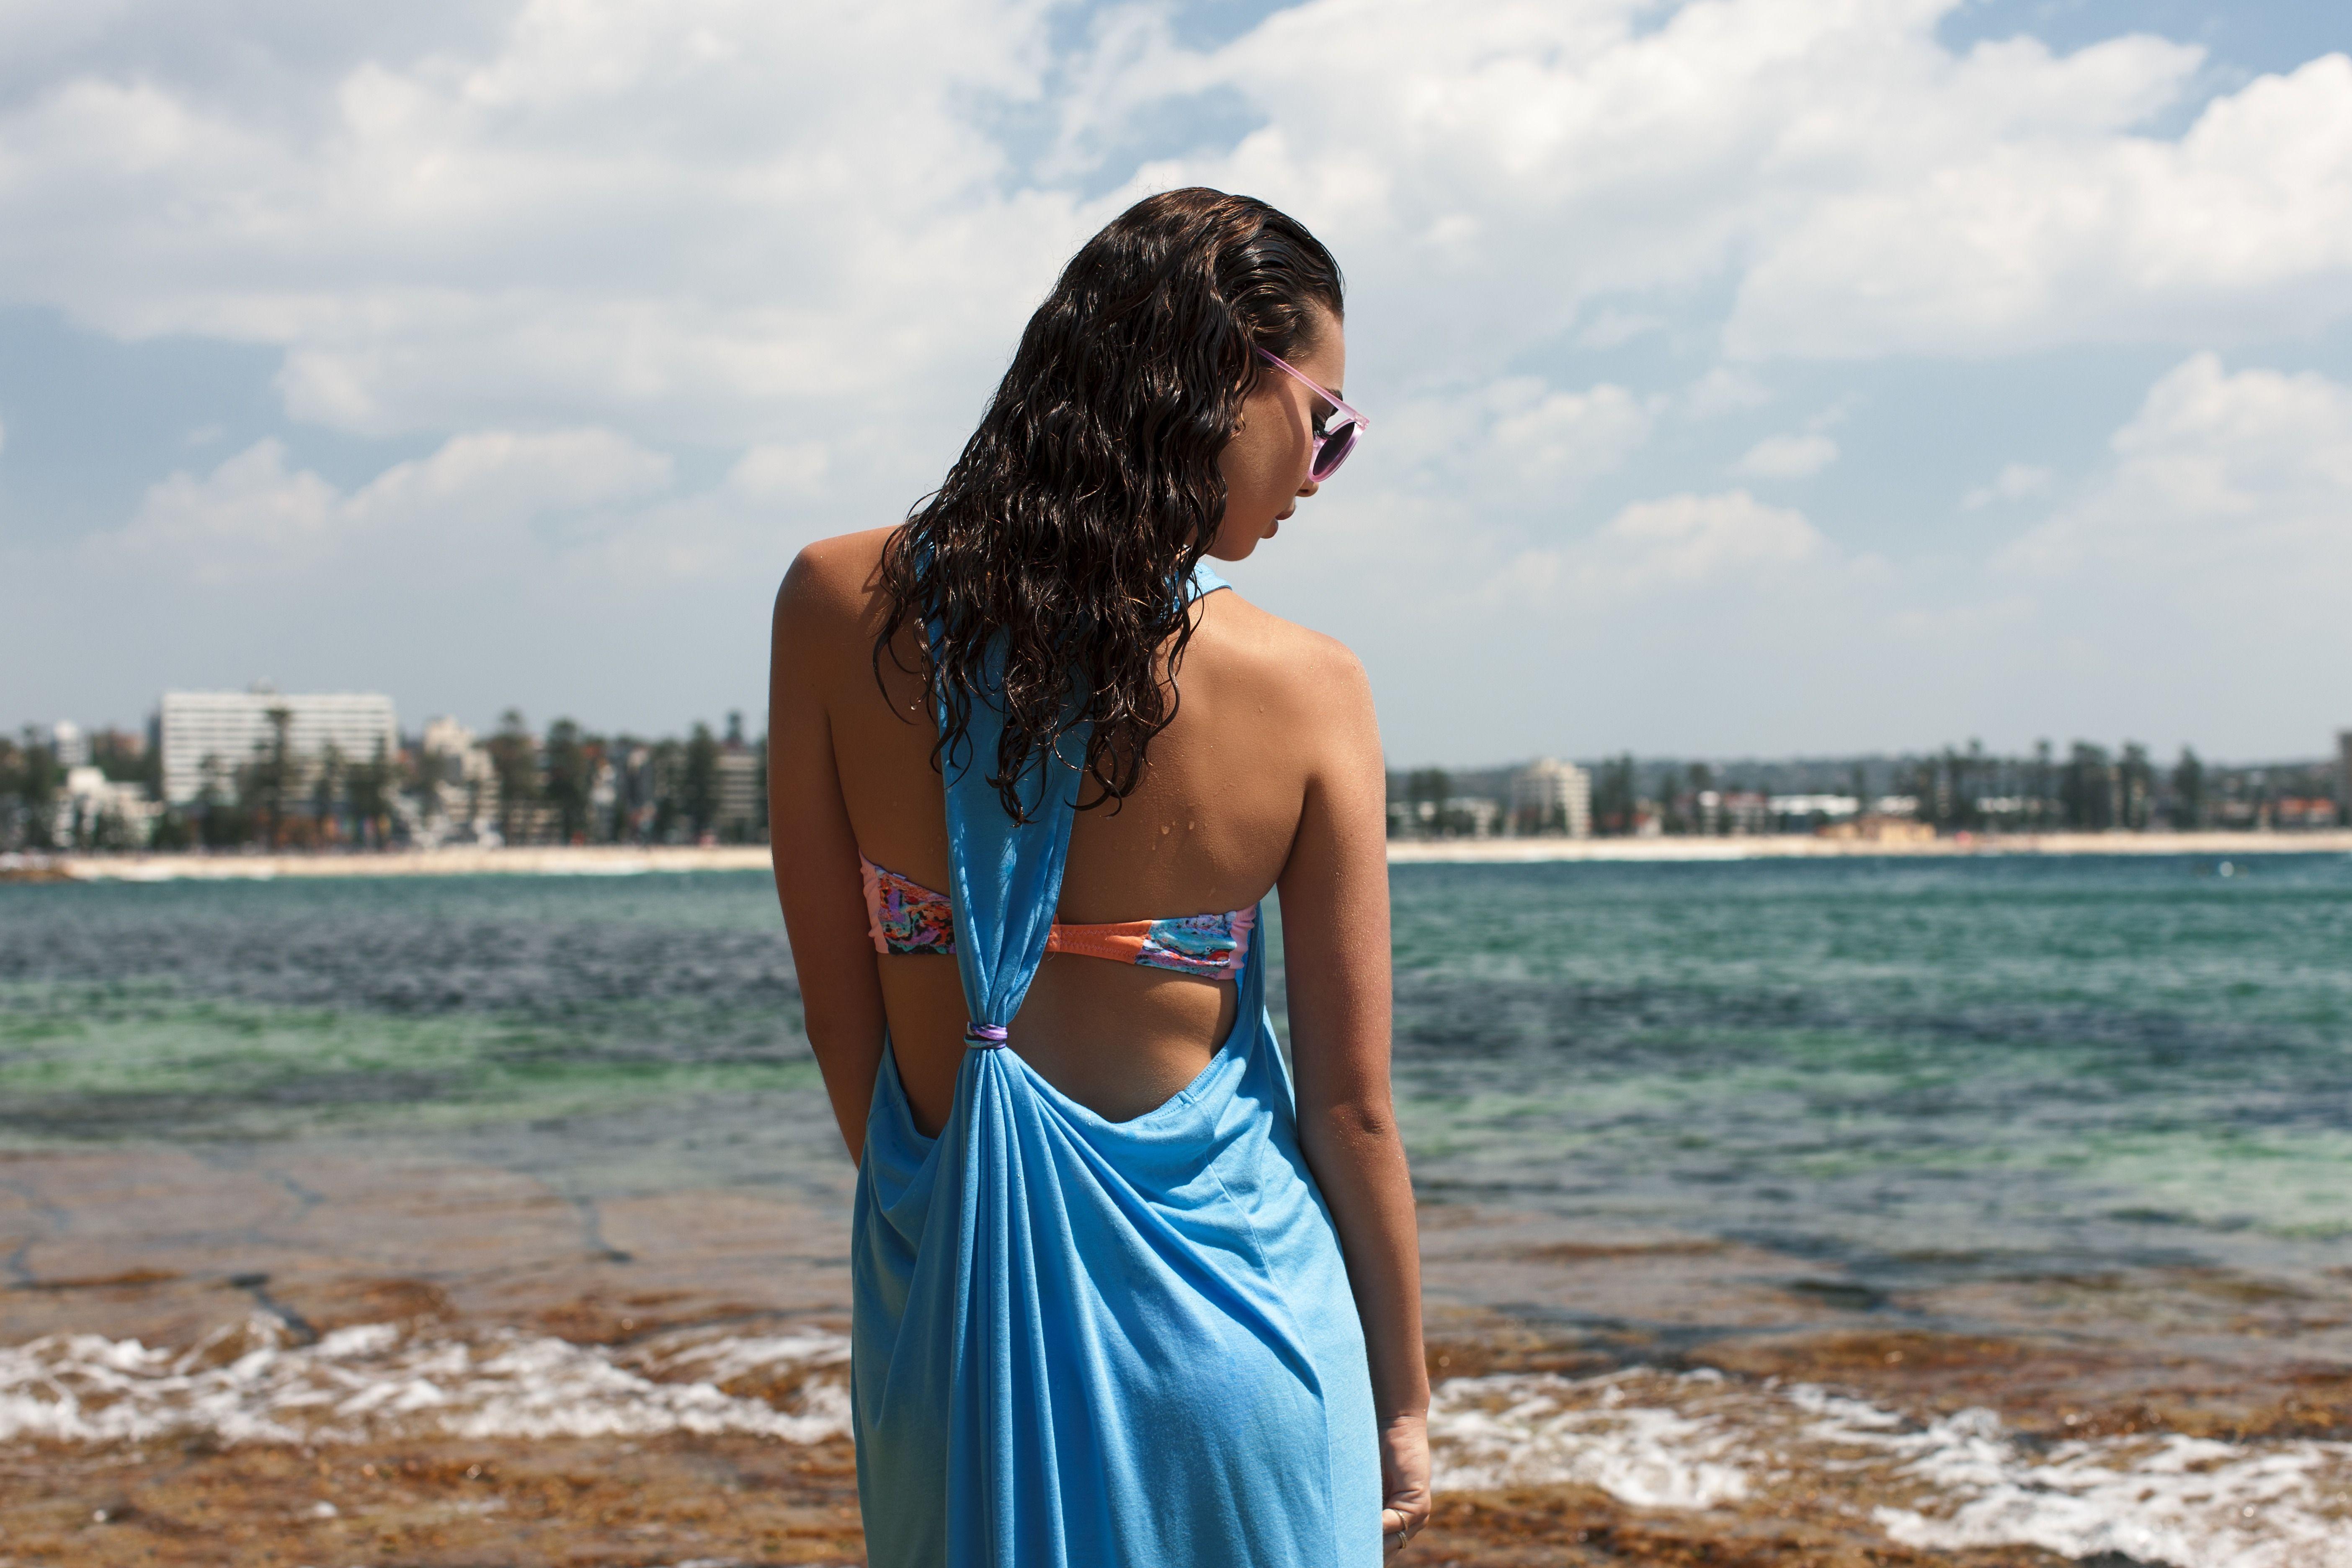 Savannah Blue SS15 Campaign Beach Lingerie Ben Dilger Photography 2013 #swim #beach